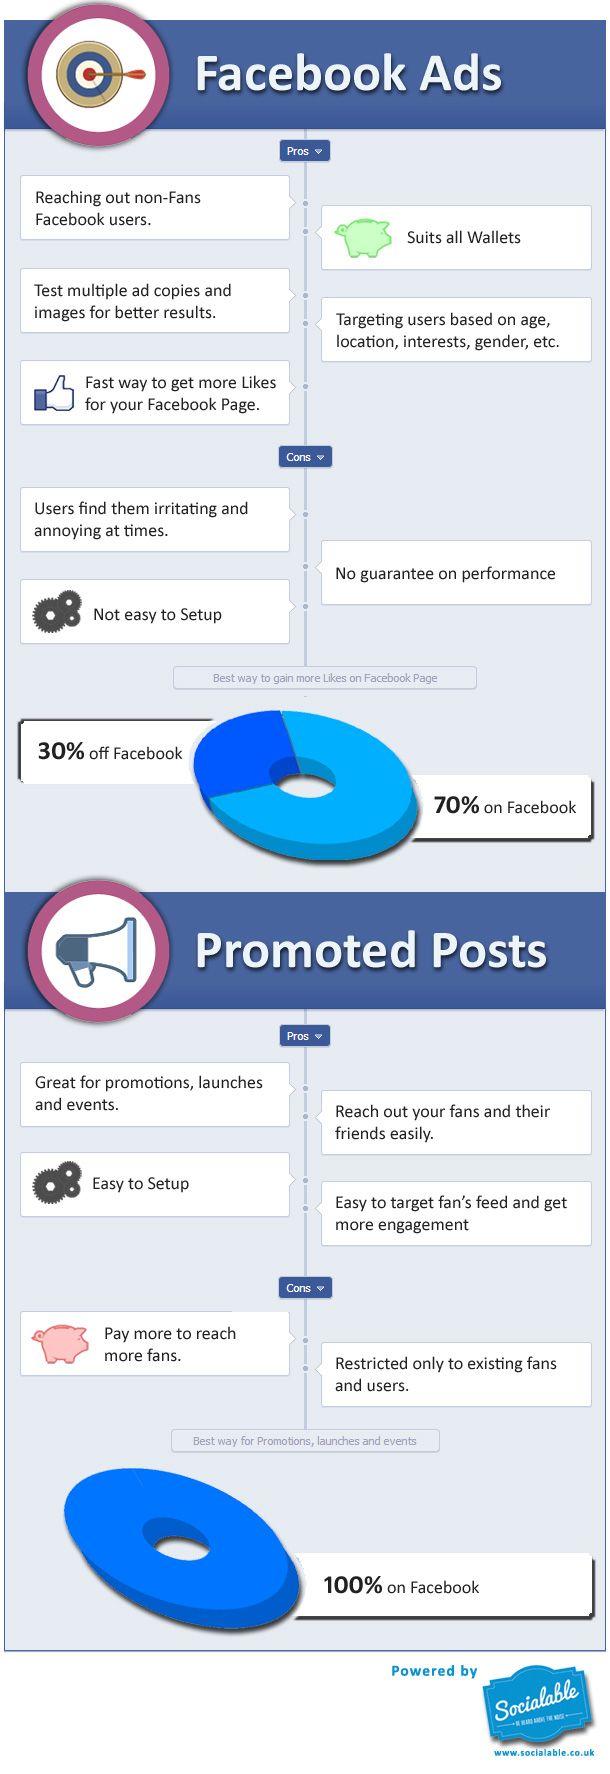 #Facebook Ads vs #PromotedPosts Pros & Cons